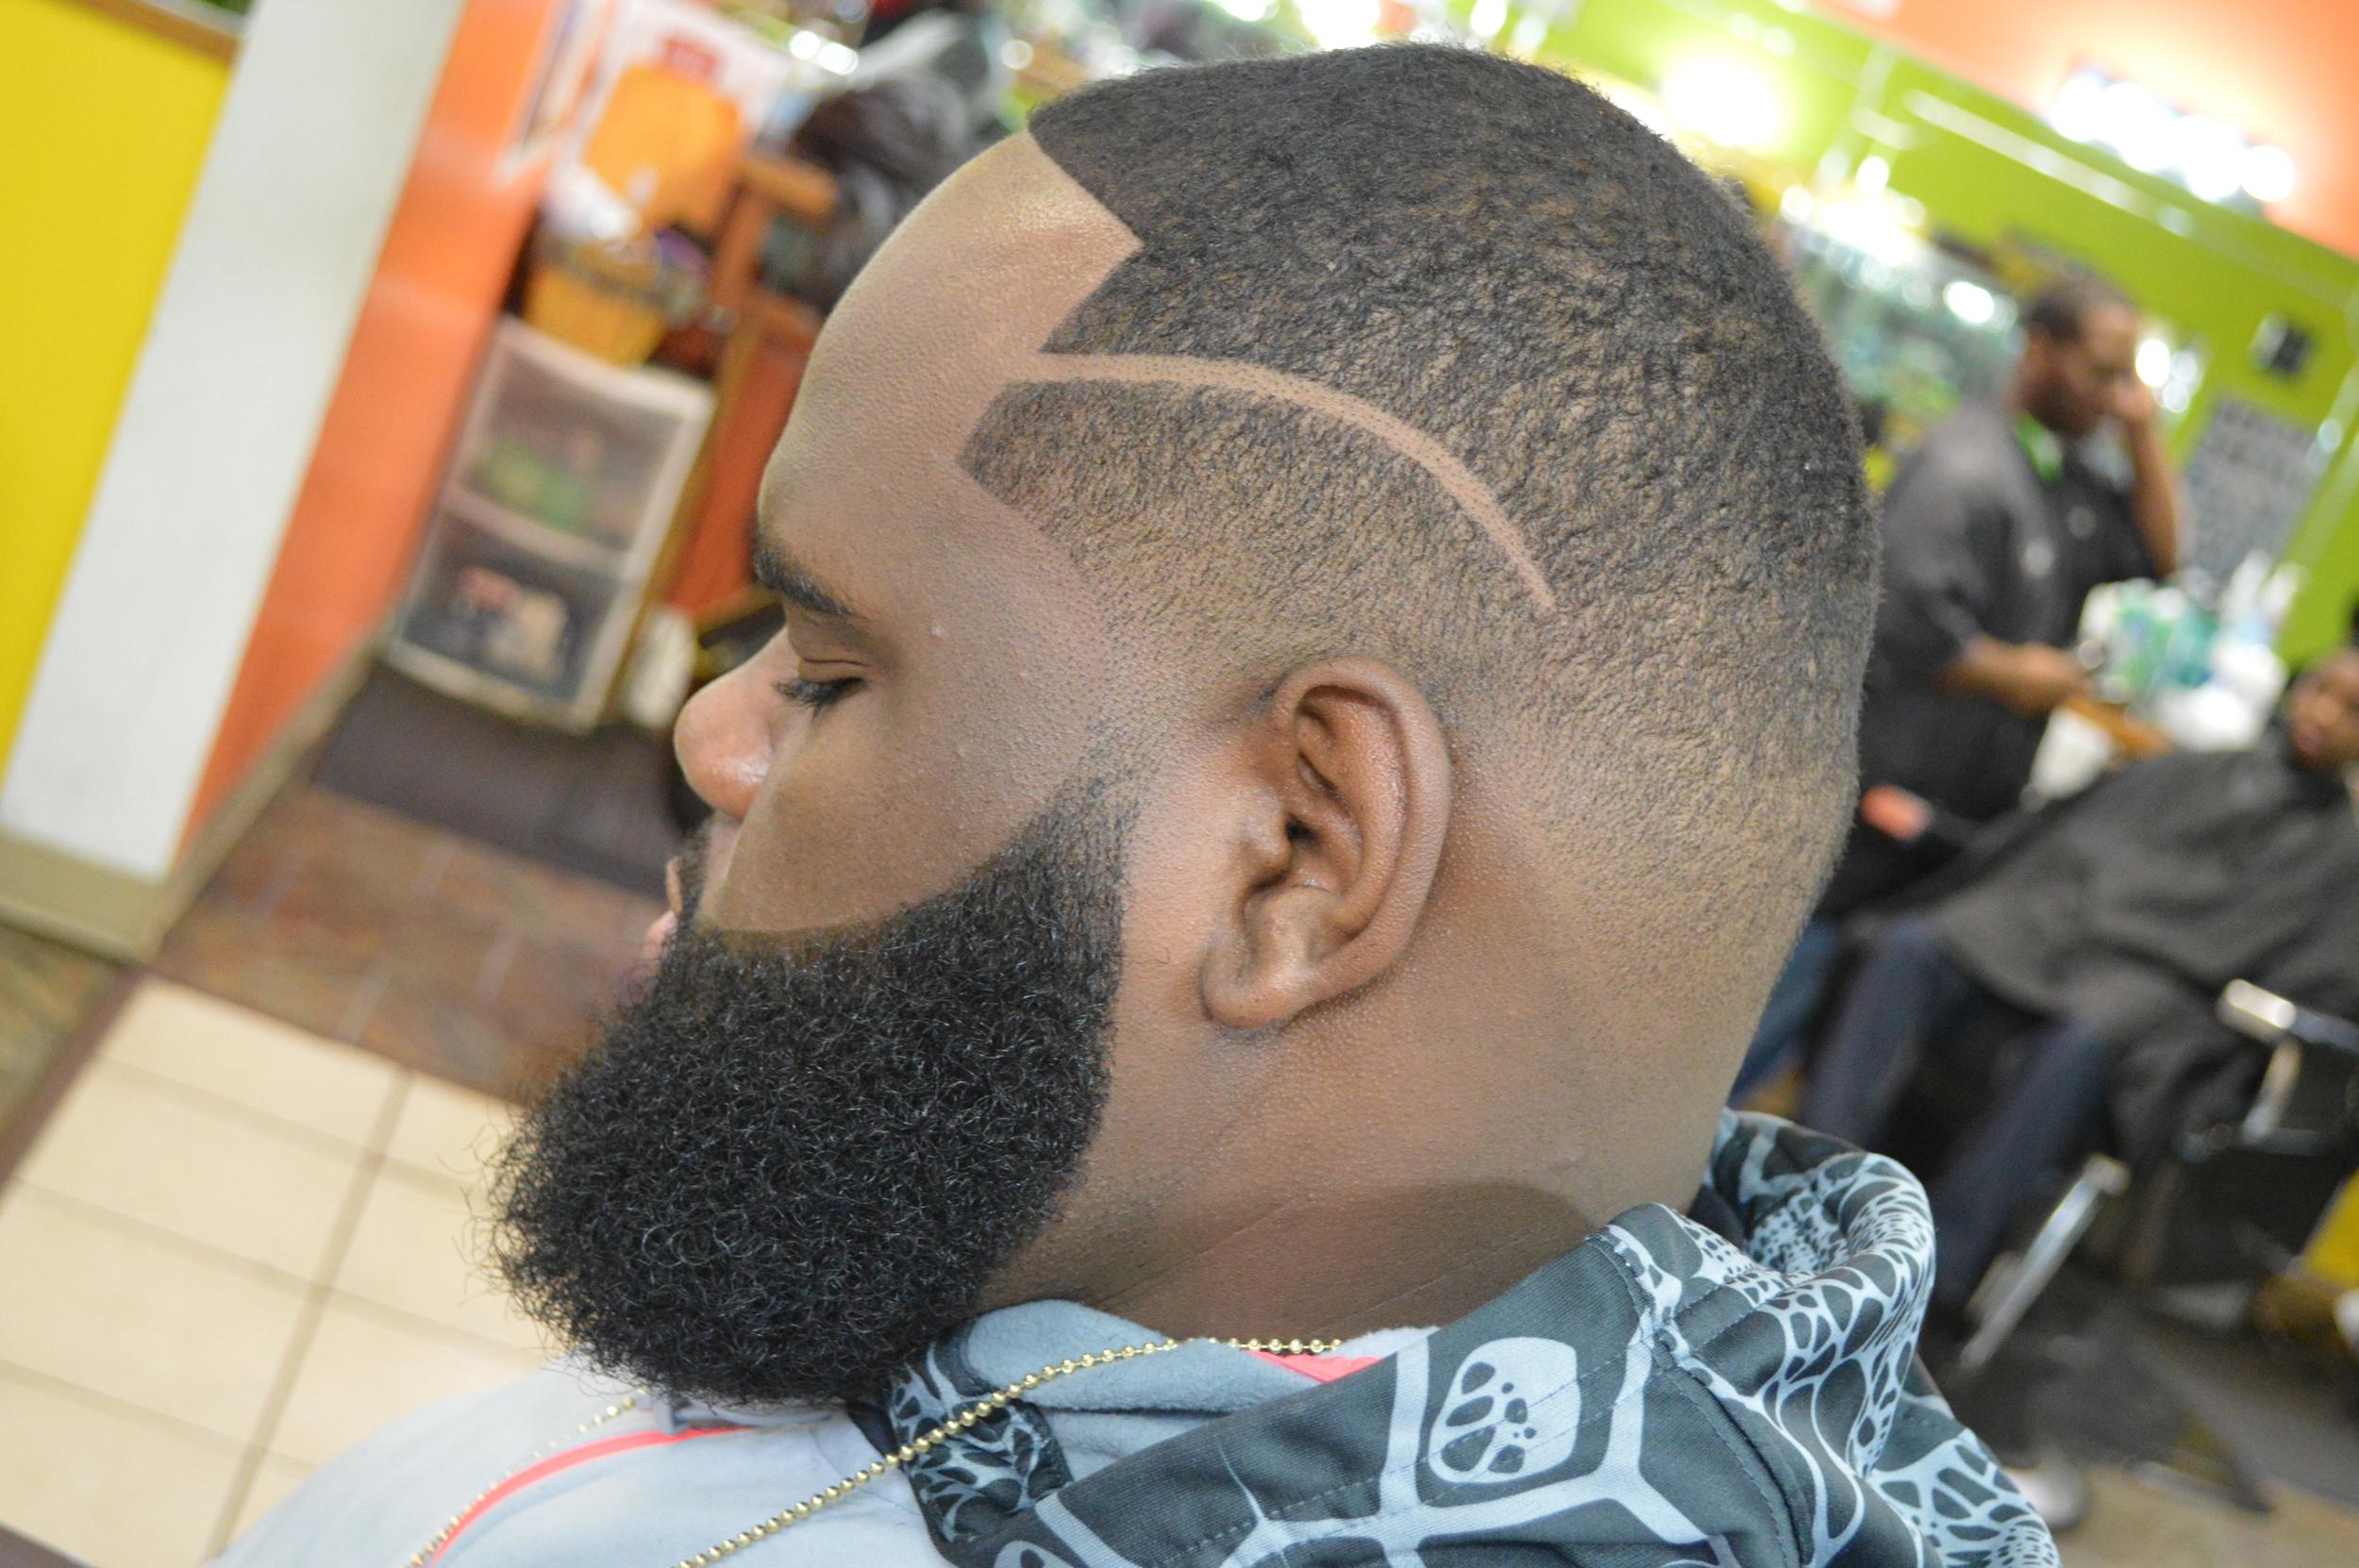 profile tapered beard (needs editing).JPG